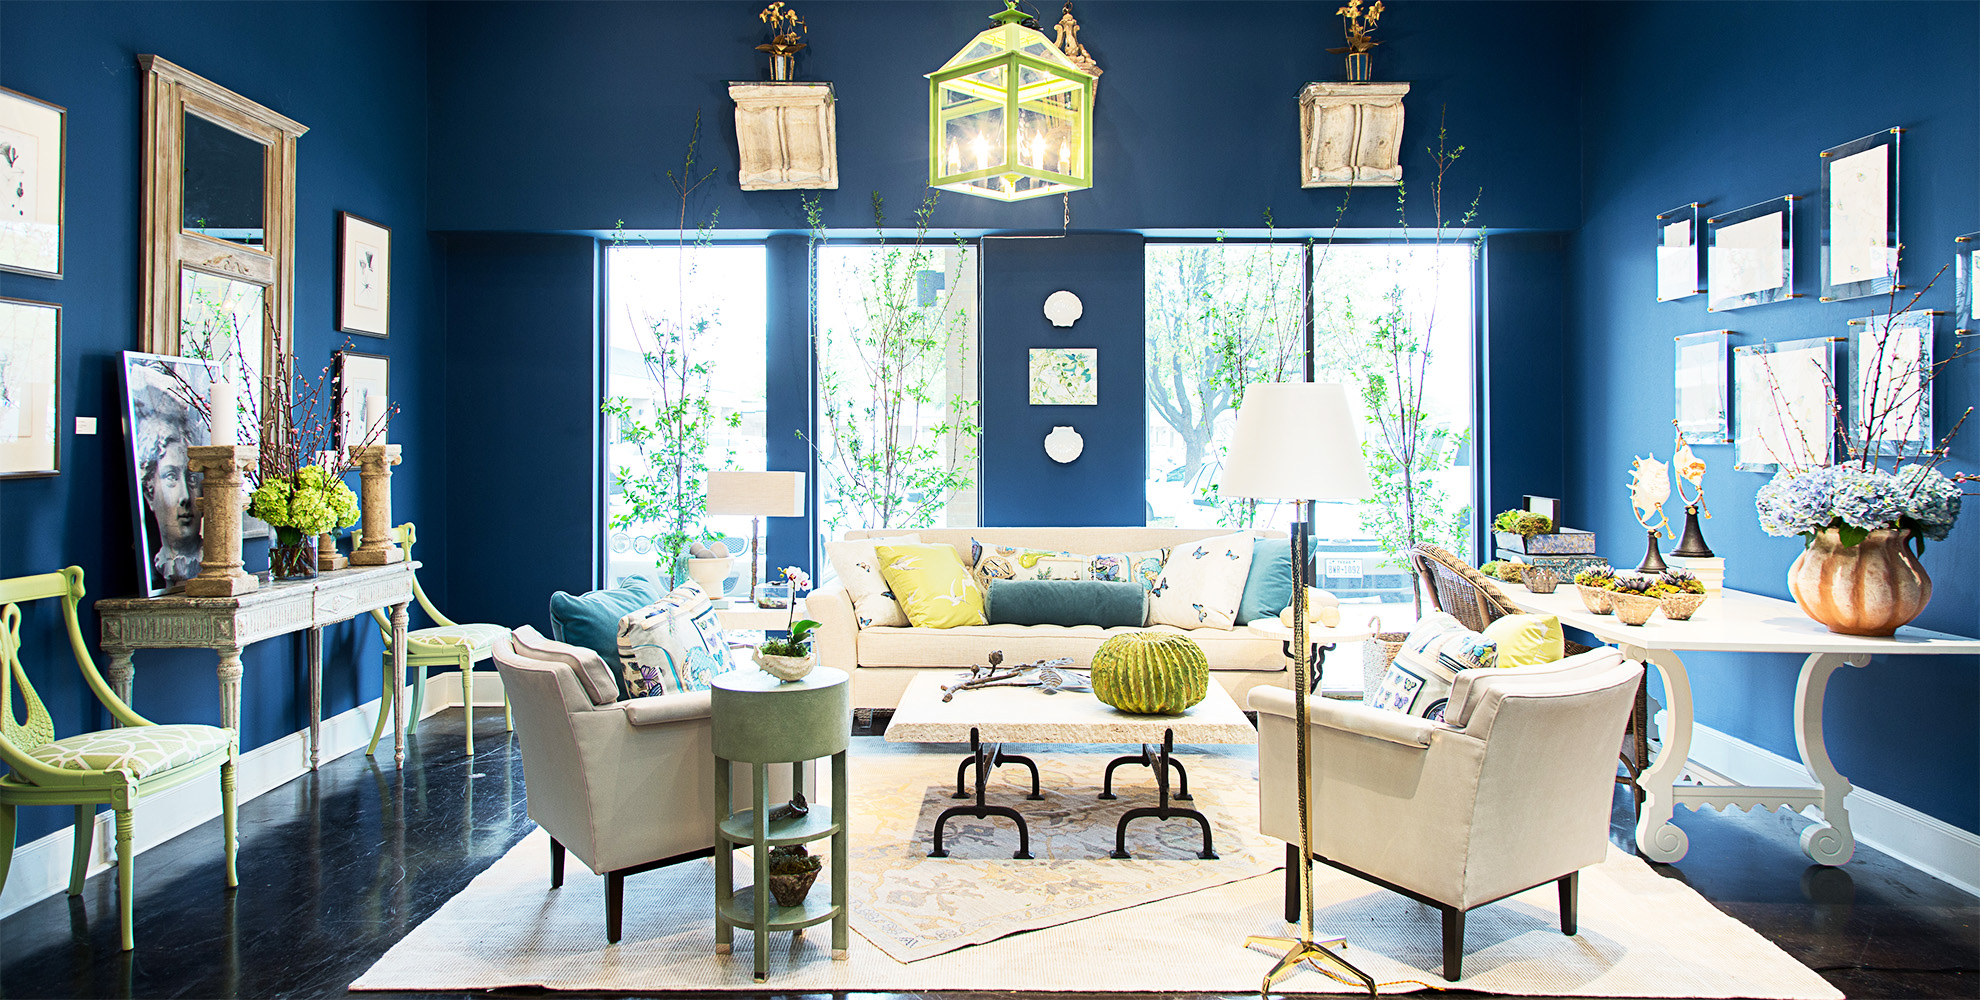 Kristin Mullen Designs image